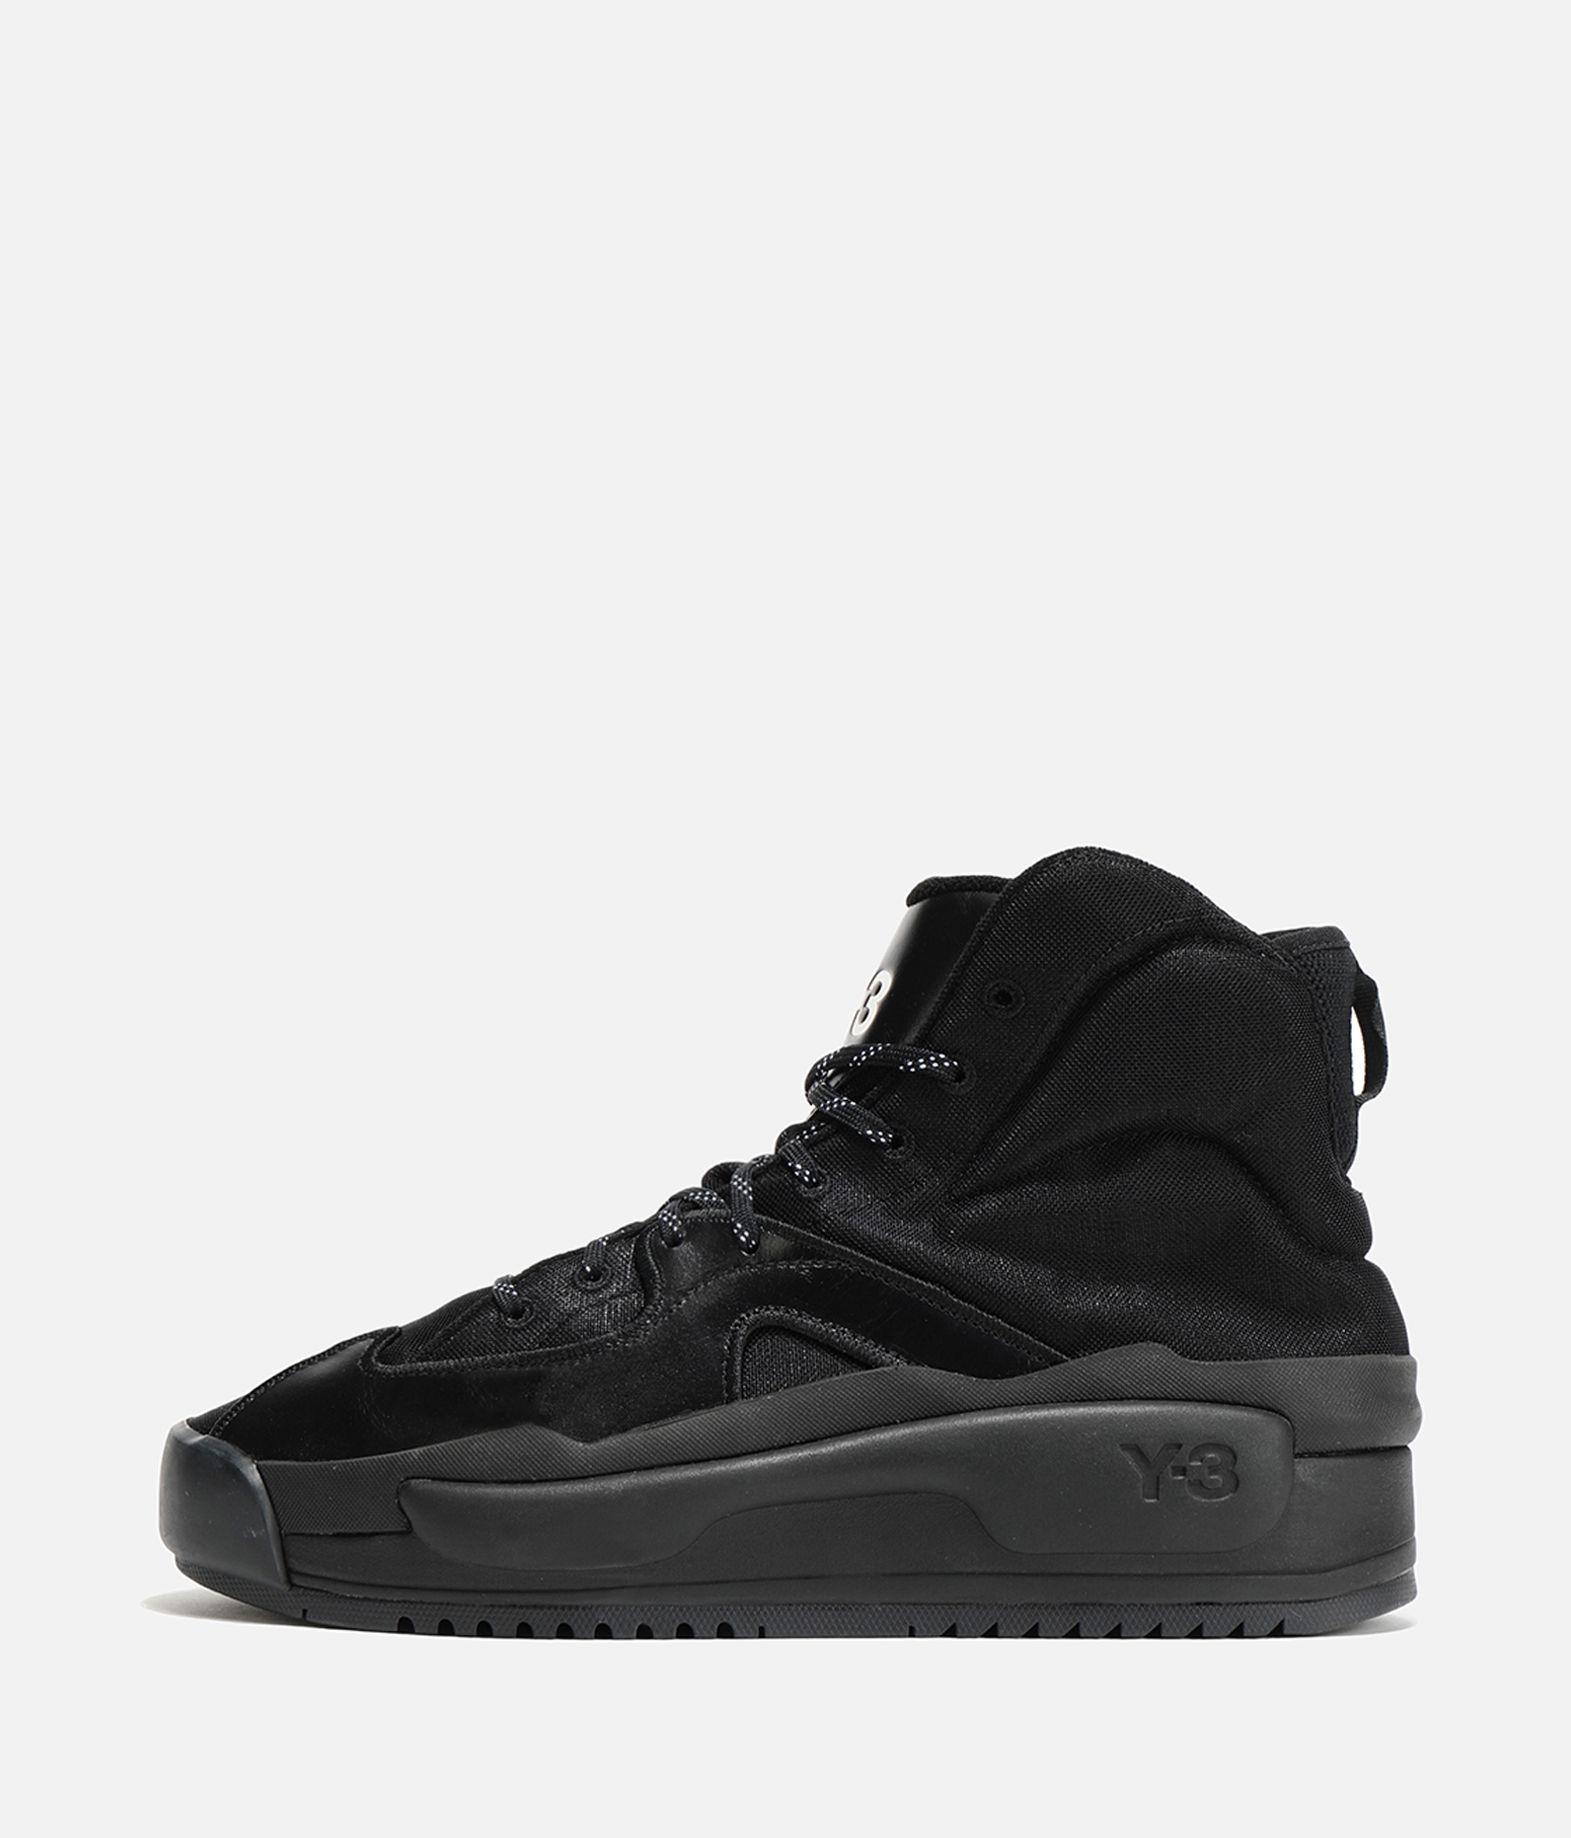 Y-3 Y-3 Hokori Sneakers Woman f